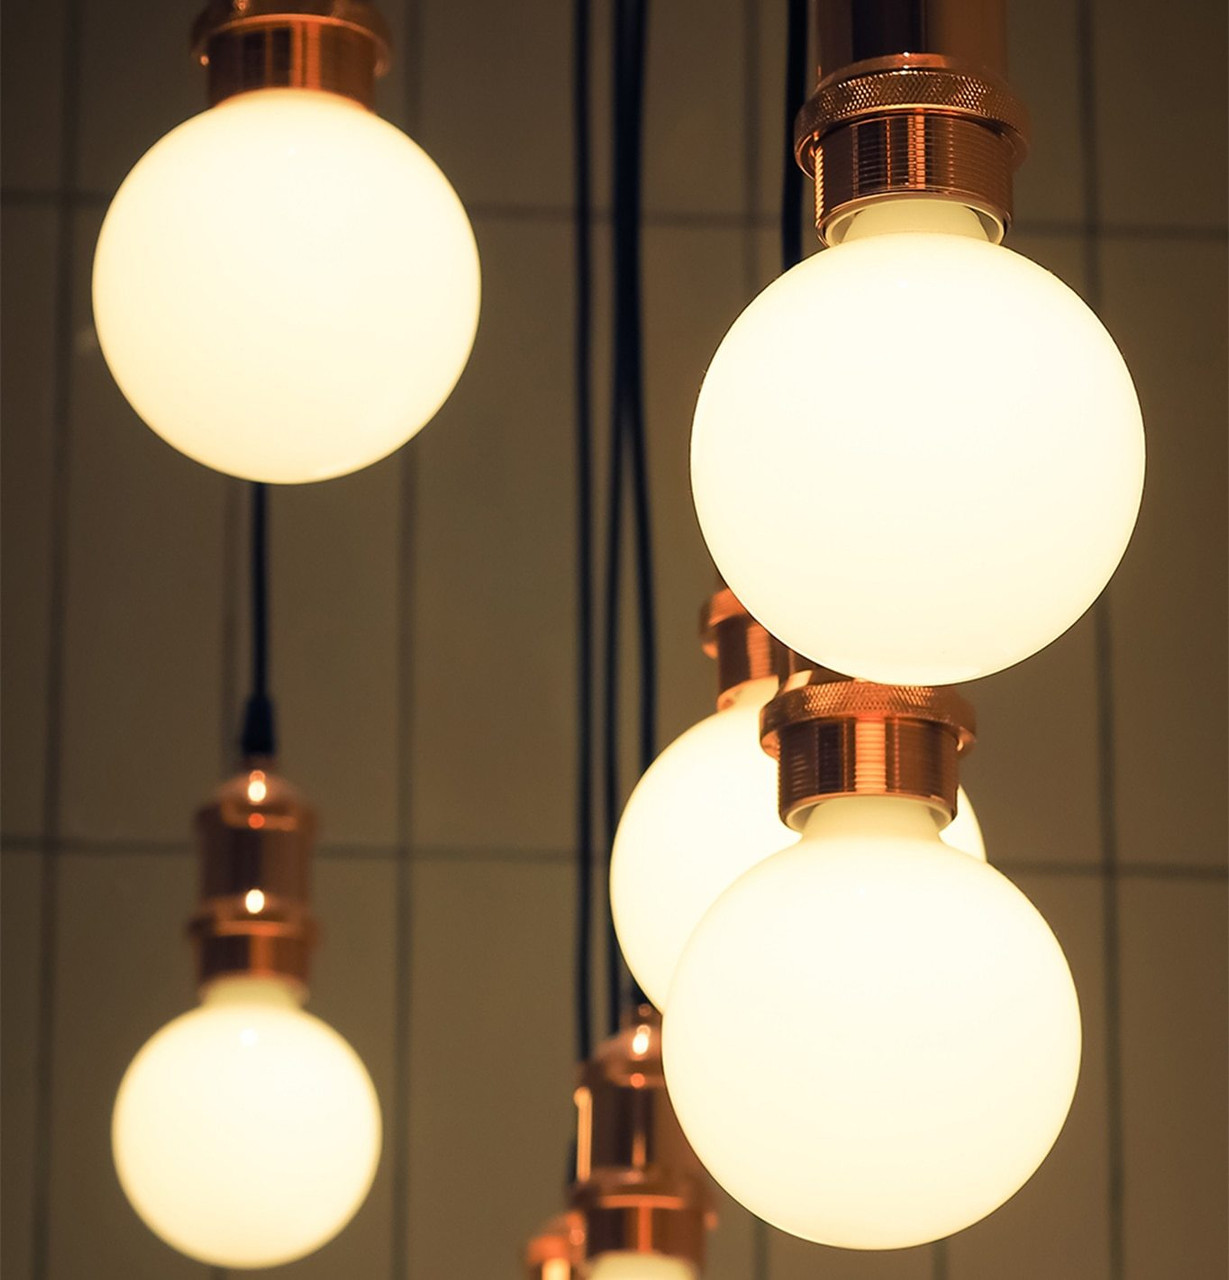 LED Dimmable Globe Vintage Light Bulbs